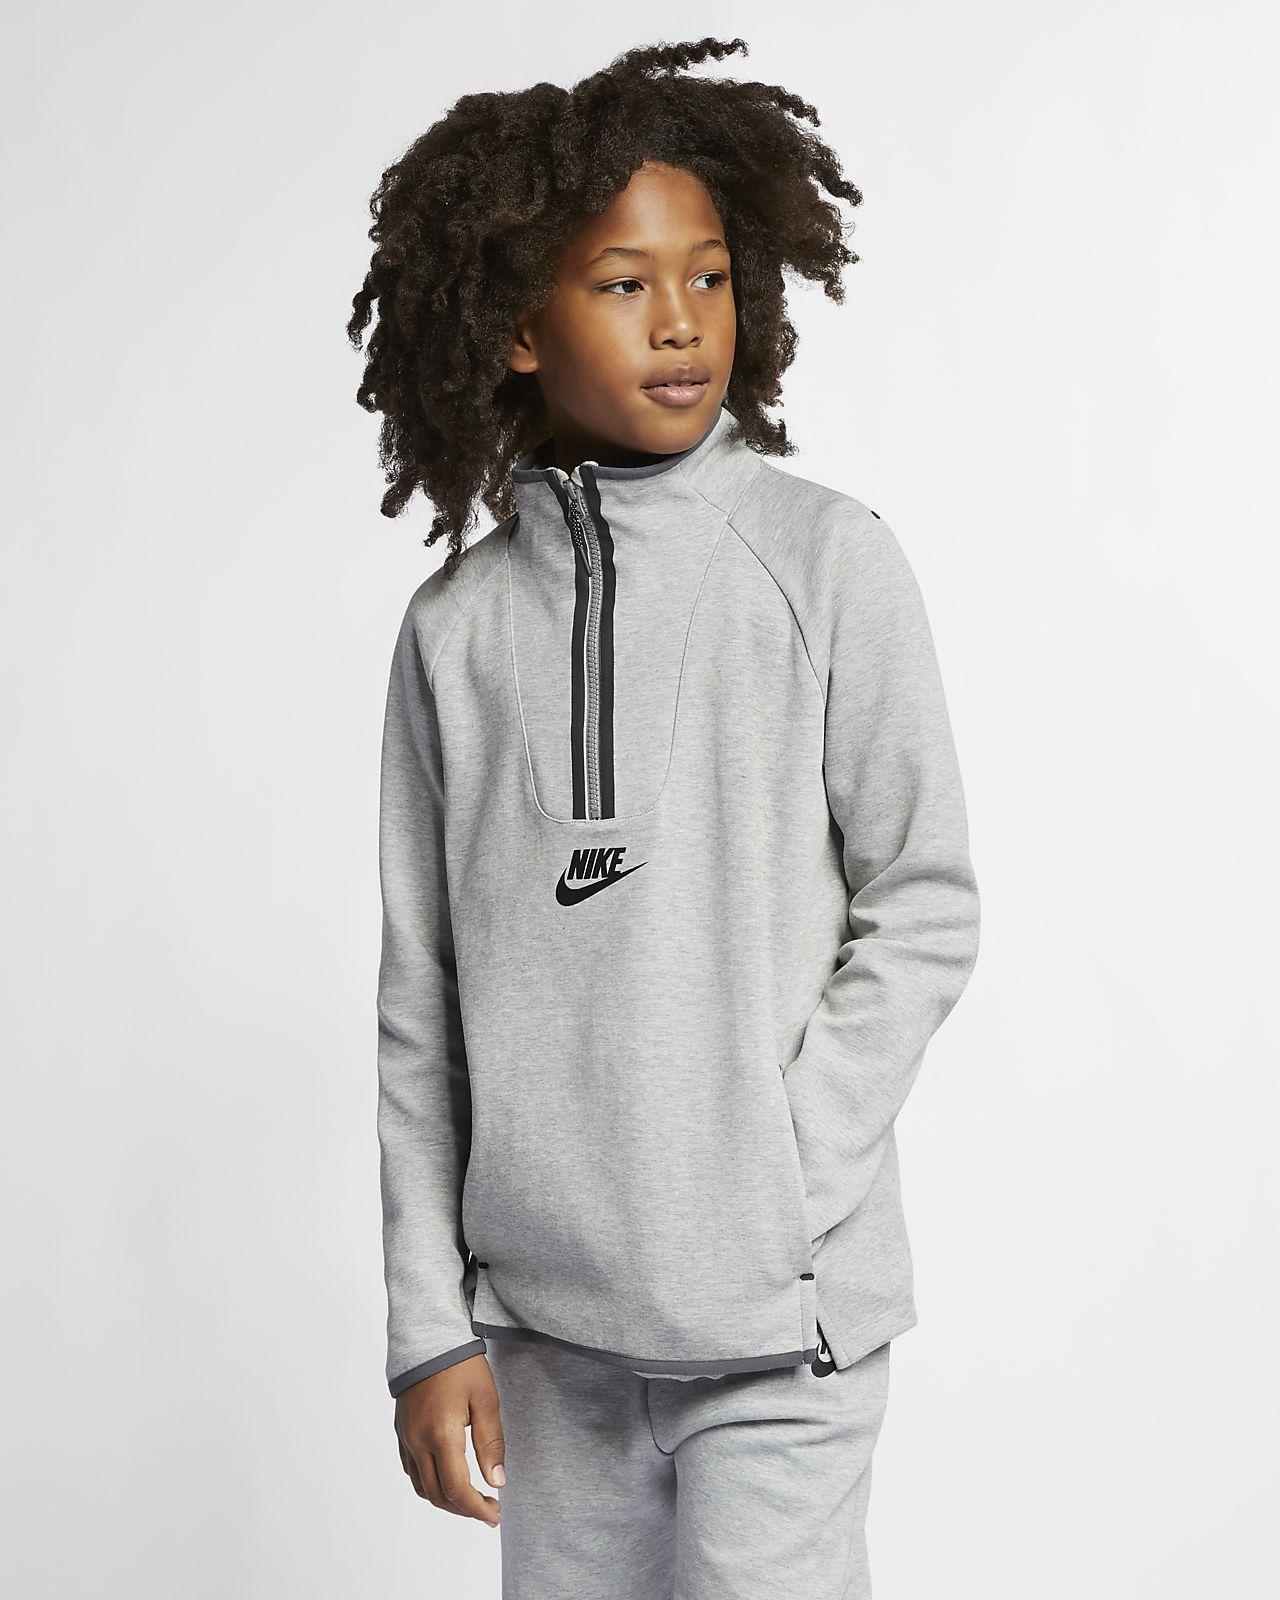 Nike Sportswear Tech Fleece Langarm-Oberteil für Kinder